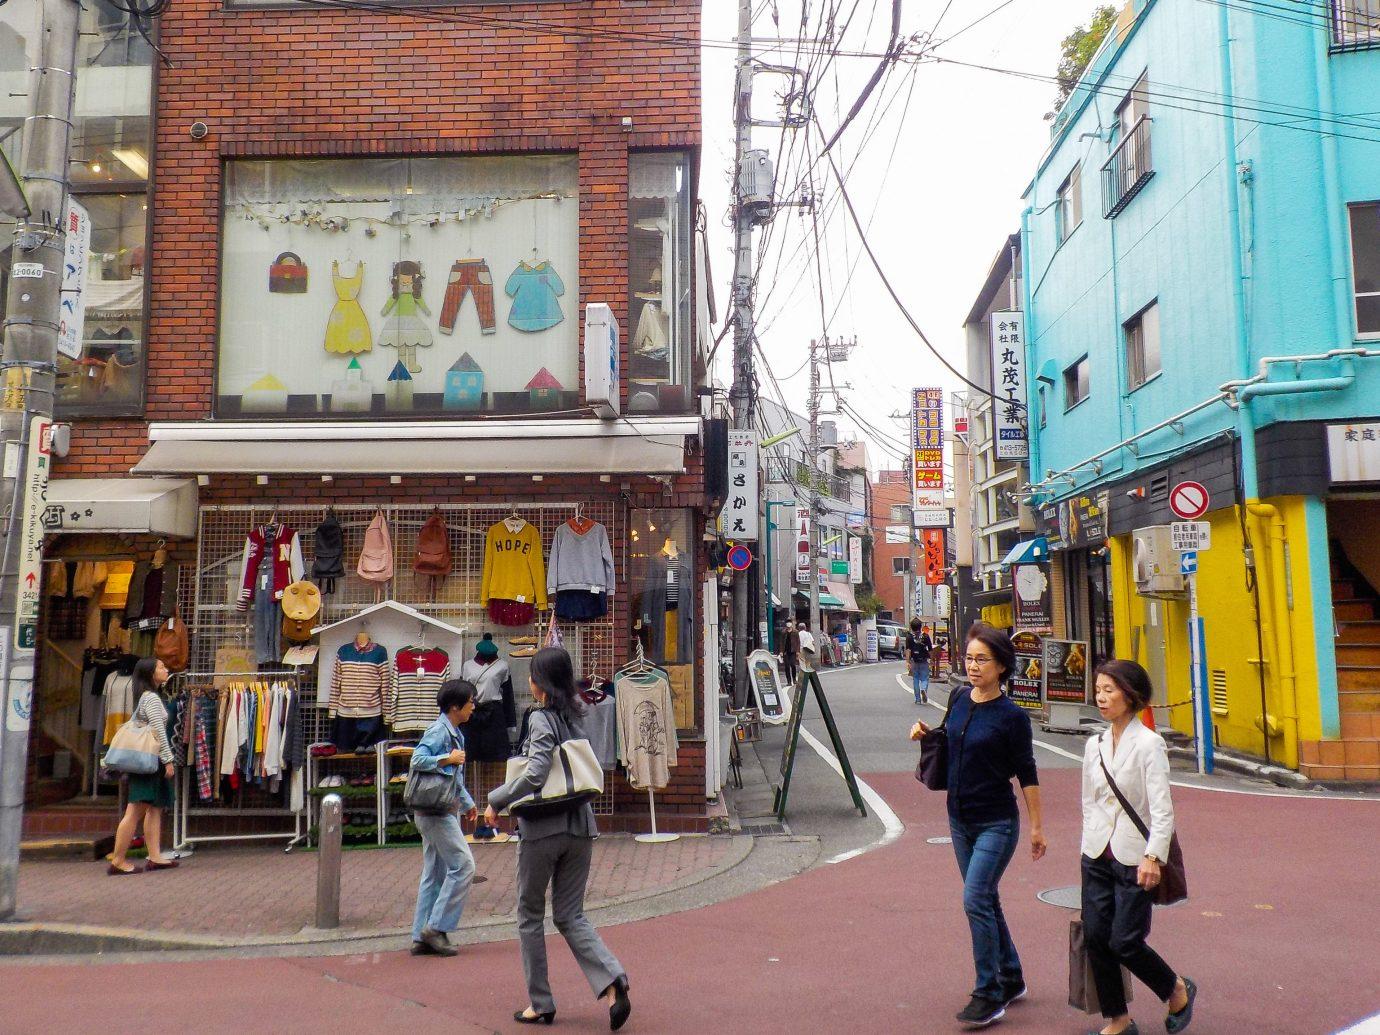 Trip Ideas outdoor building color road street crowd Town neighbourhood City pedestrian walking snapshot urban area human settlement people way tourism Downtown infrastructure shopping sidewalk